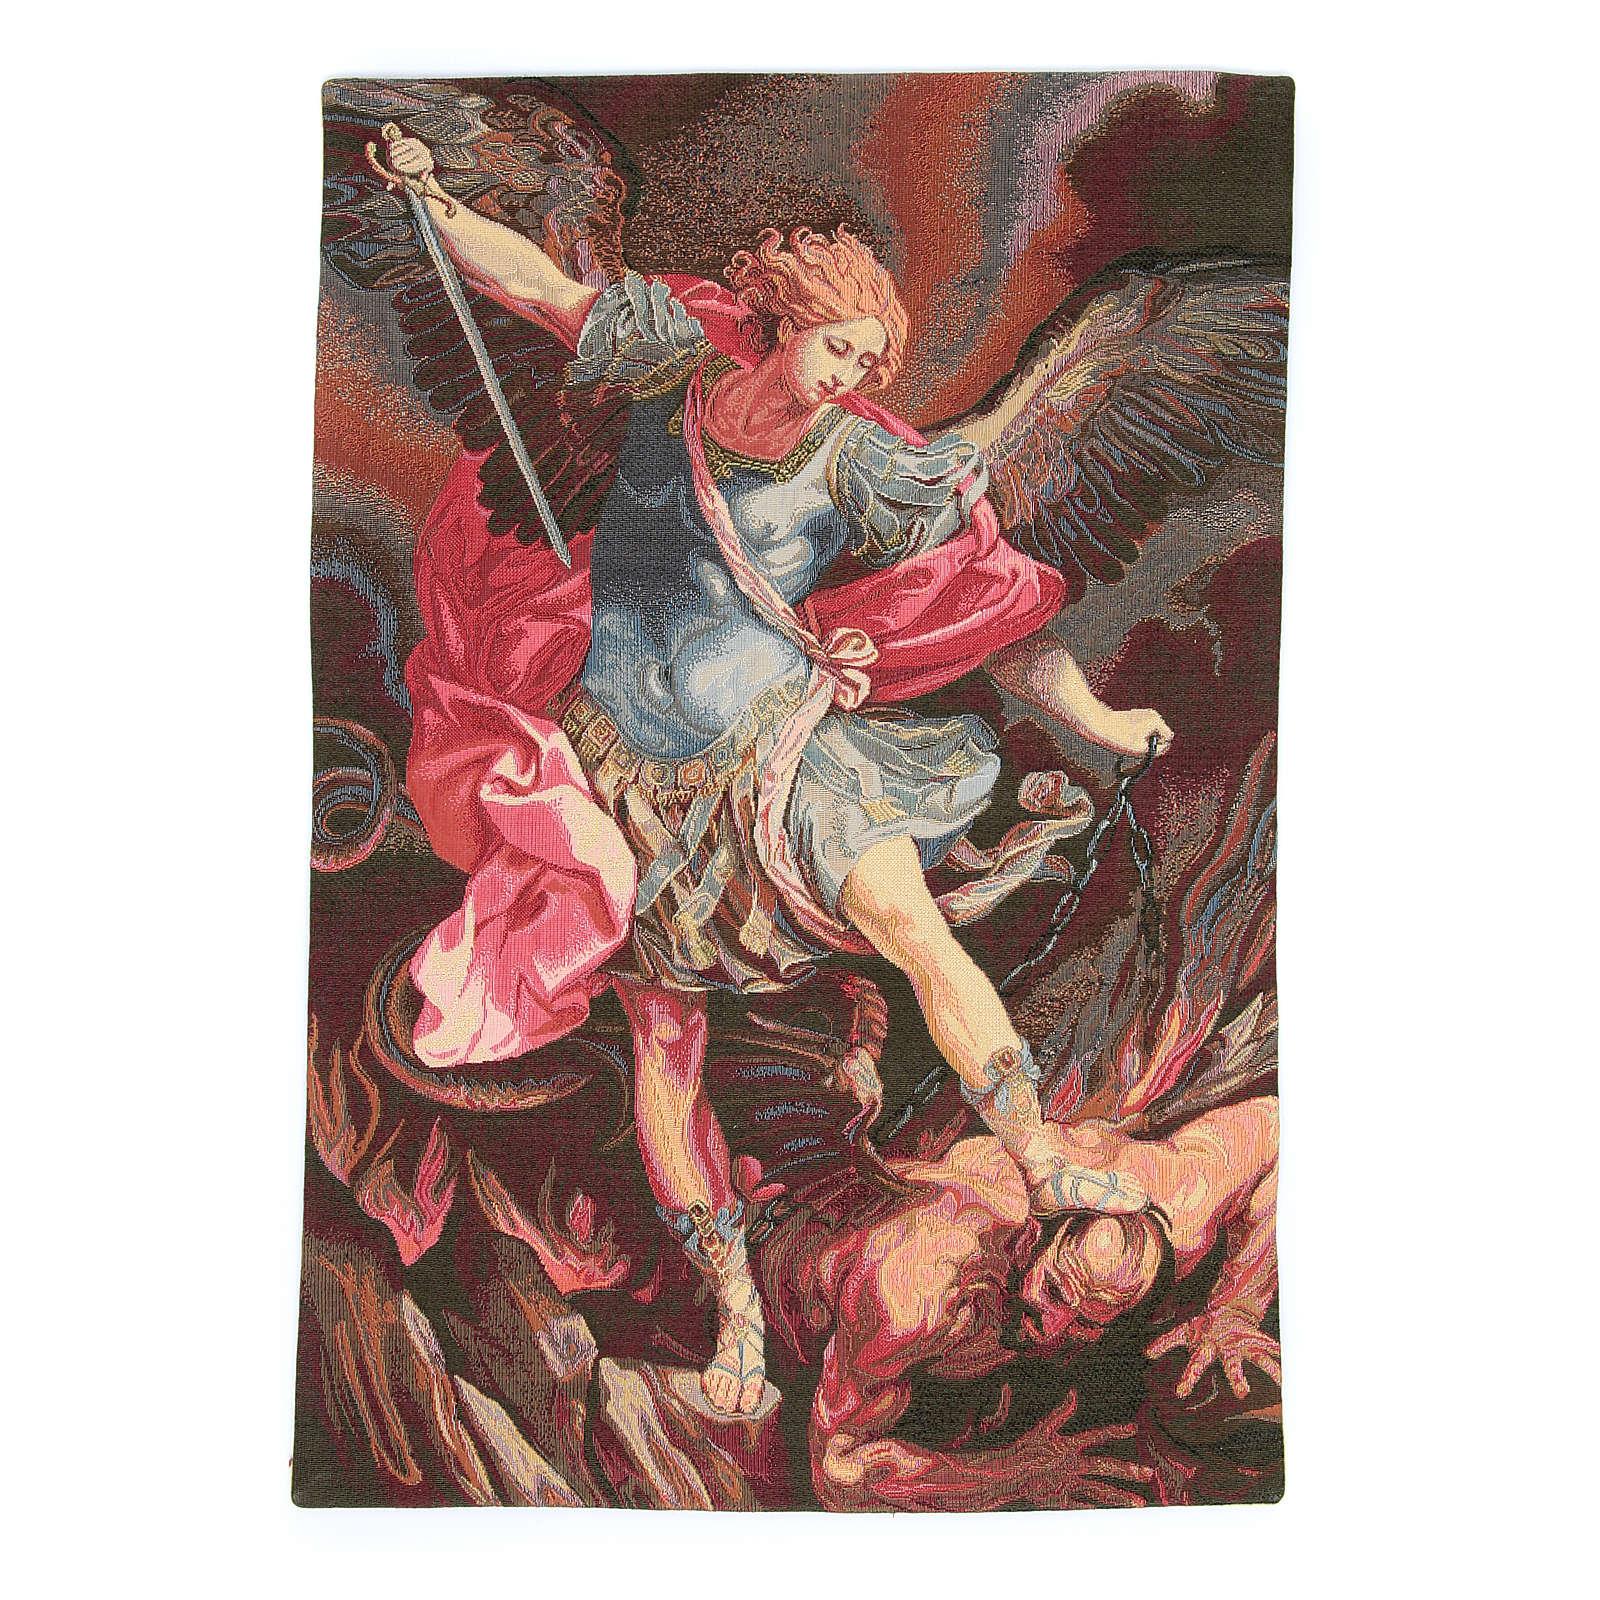 Arazzo San Michele Arcangelo di Guido Reni 50x30 cm 3